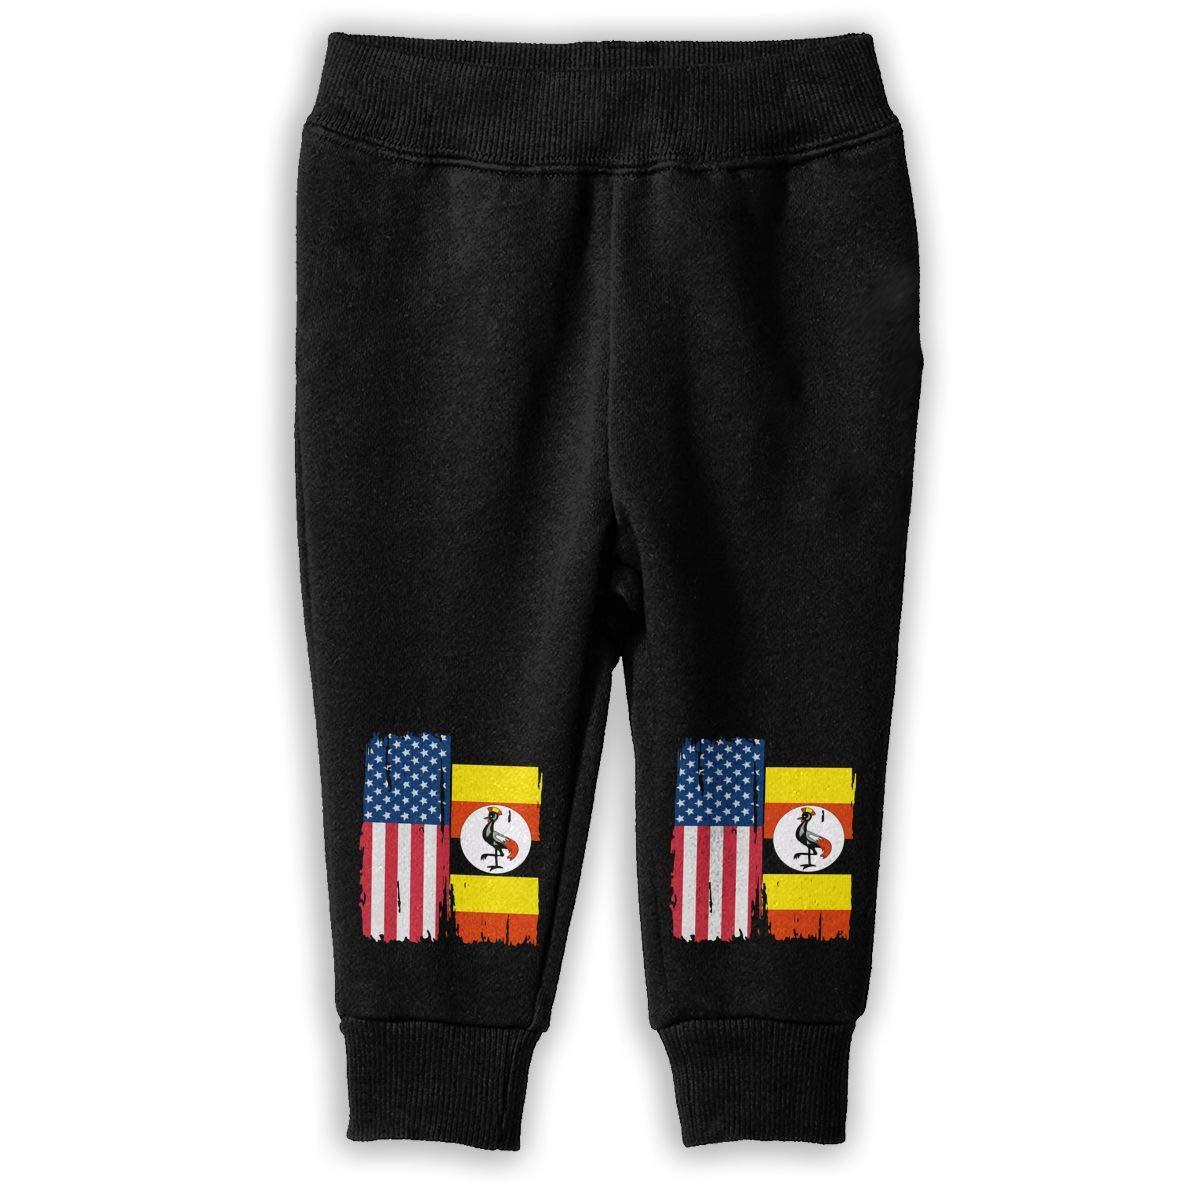 NJKM5MJ American Uganda Flag Sweatpants Baby Girls Sport Jogging Pants